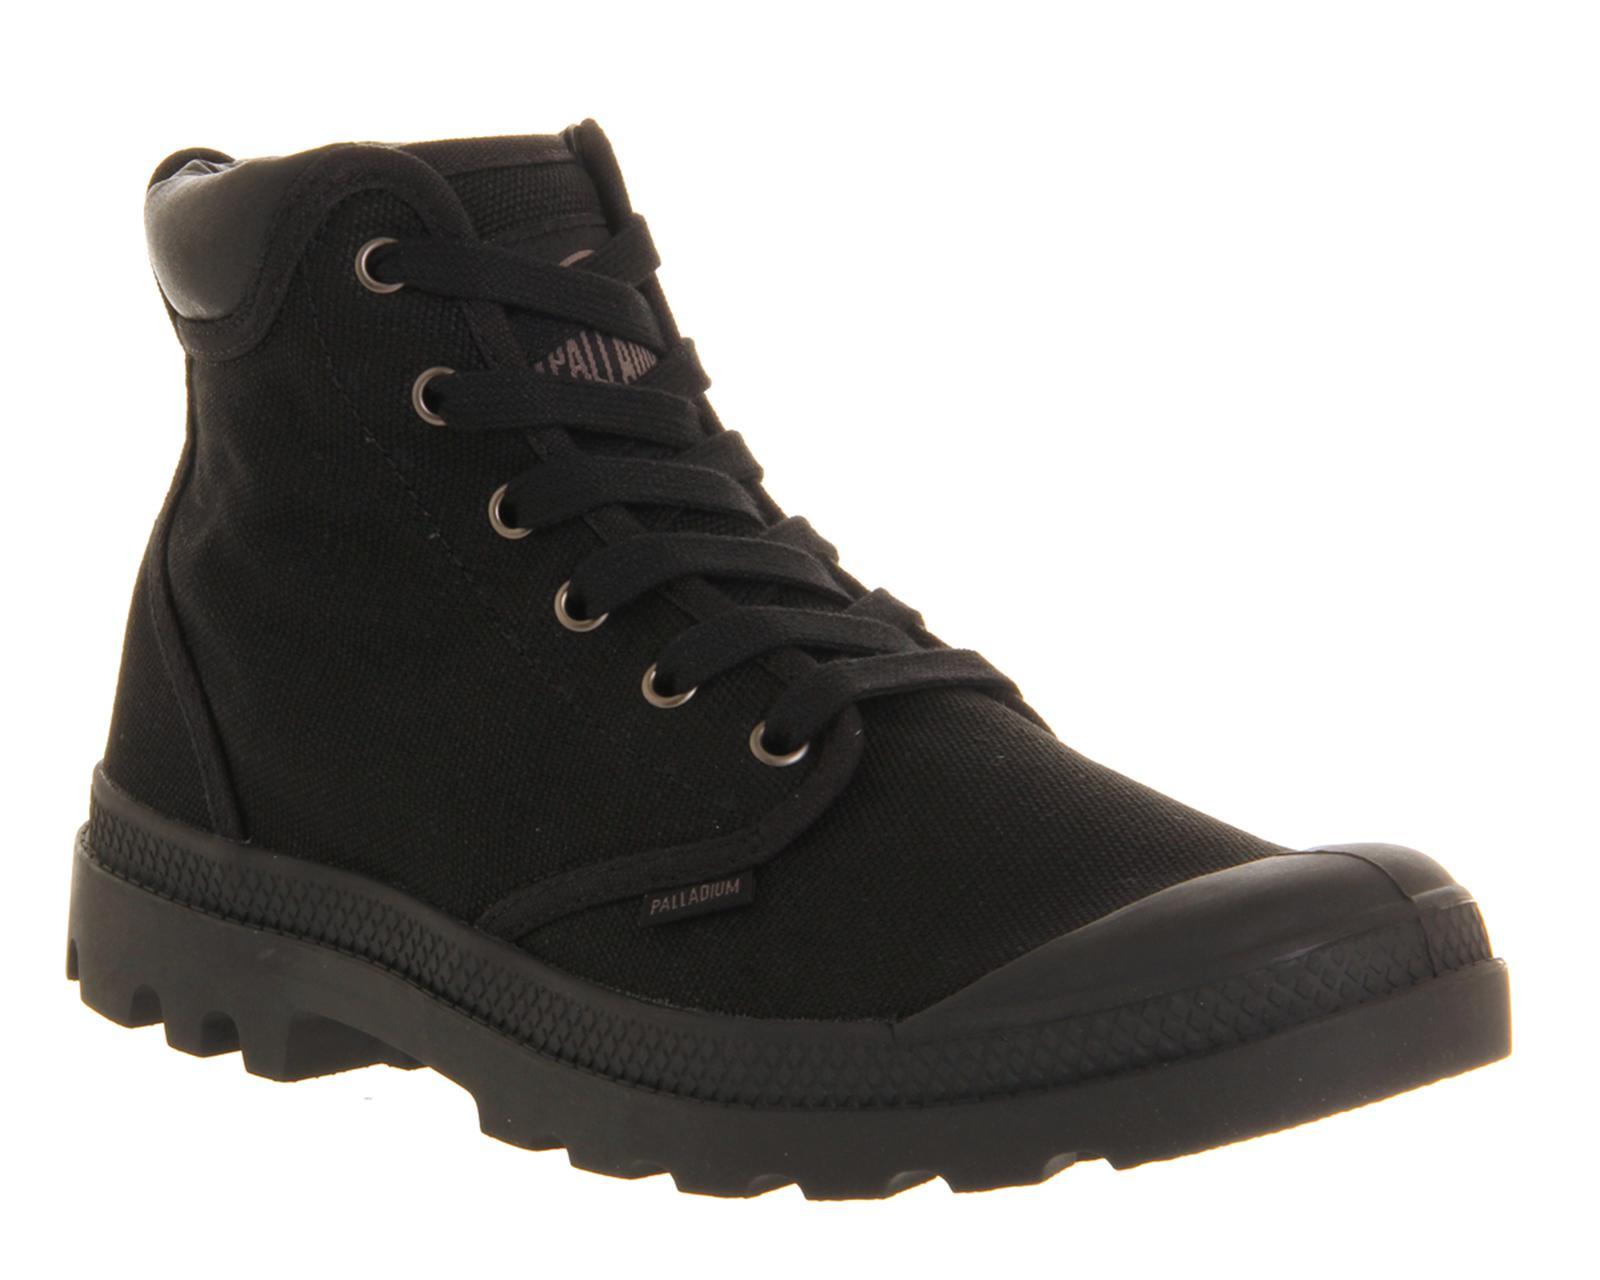 Palladium Pampa Hi Cuff Boots In Black For Men Lyst